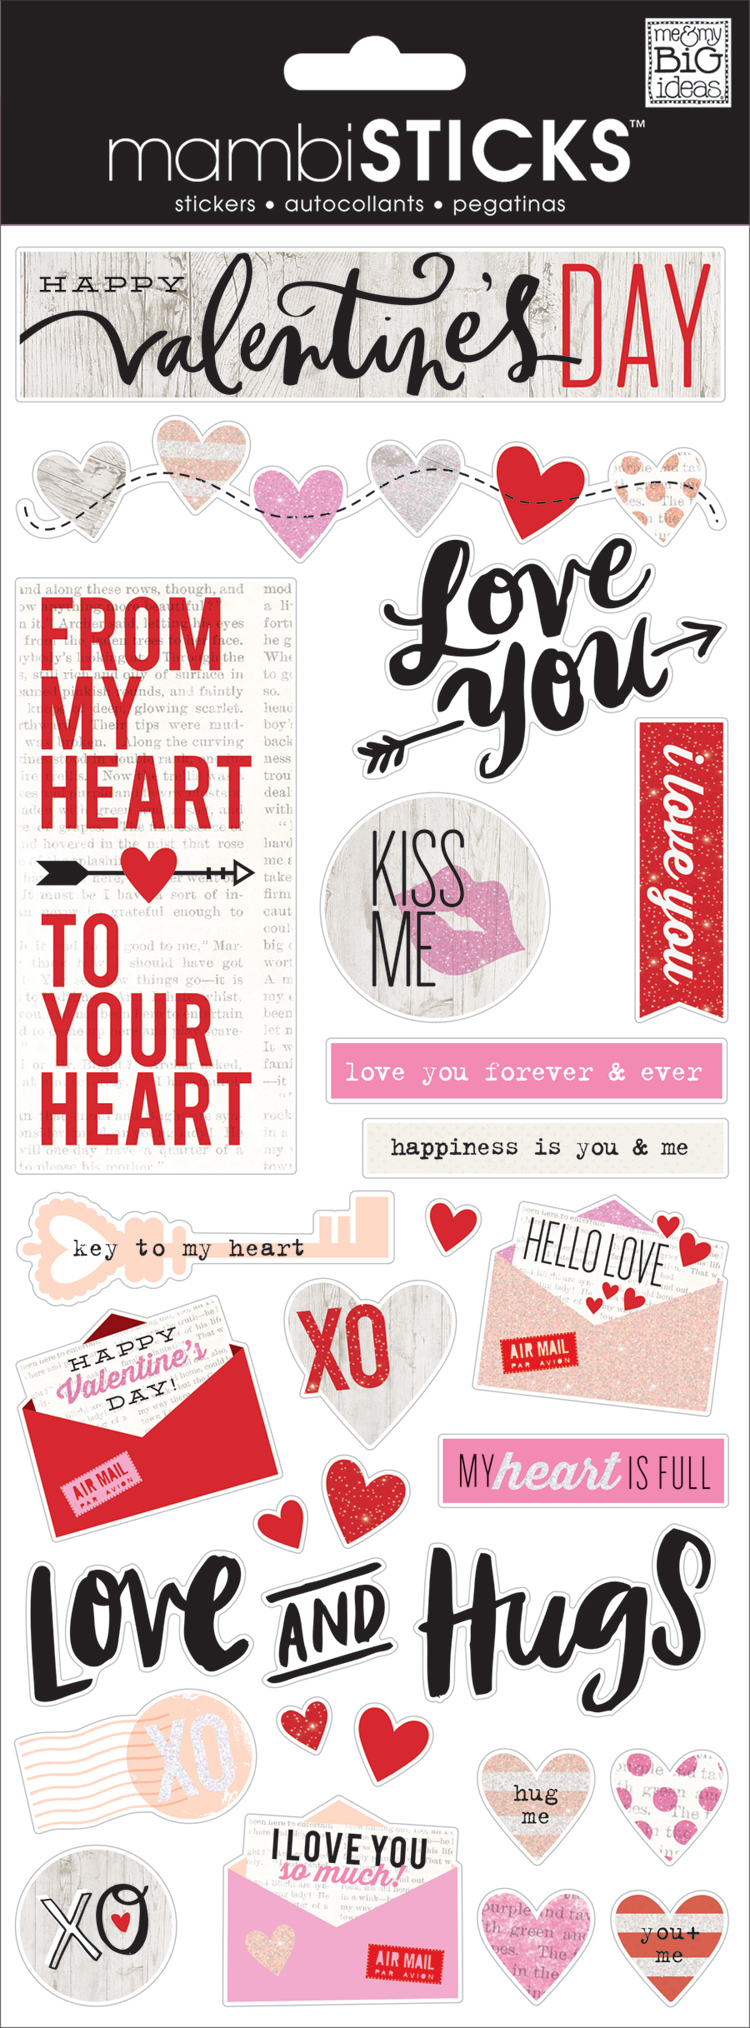 'Happy Valentine's Day' mambiSTICKS stickers | me & my BIG ideas.jpg